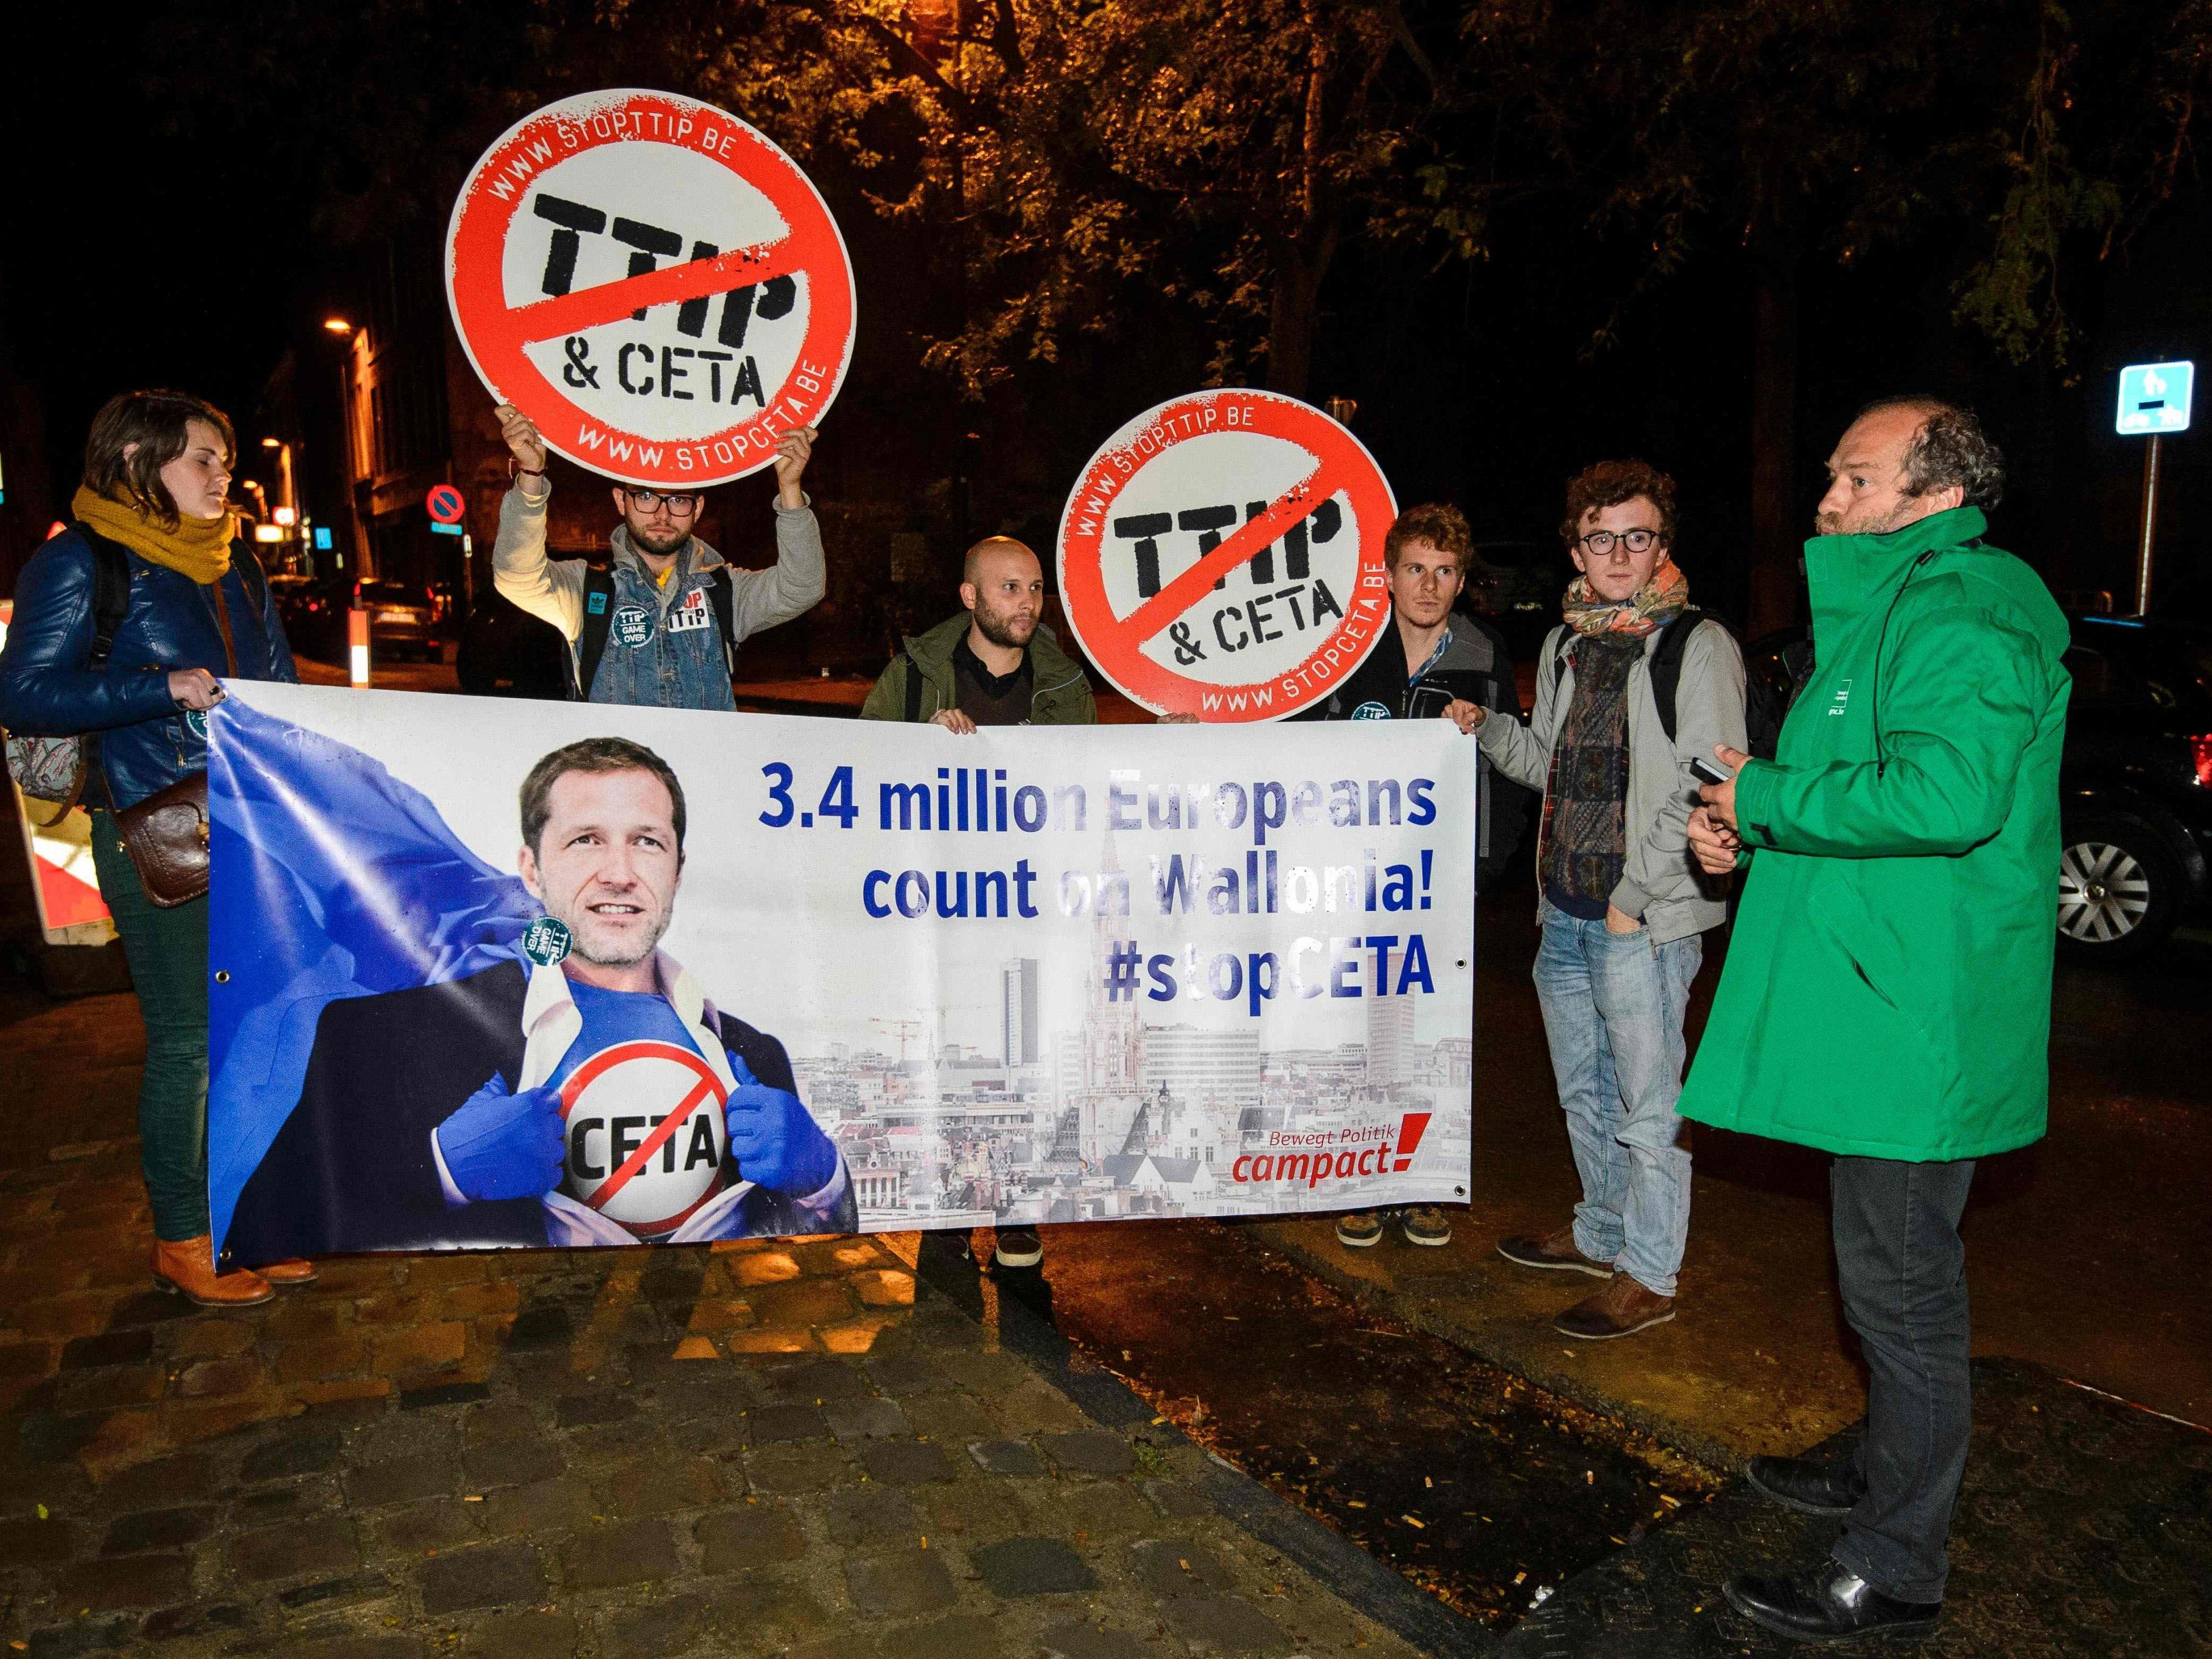 Proteste gegen CETA und TTIP in Belgien.